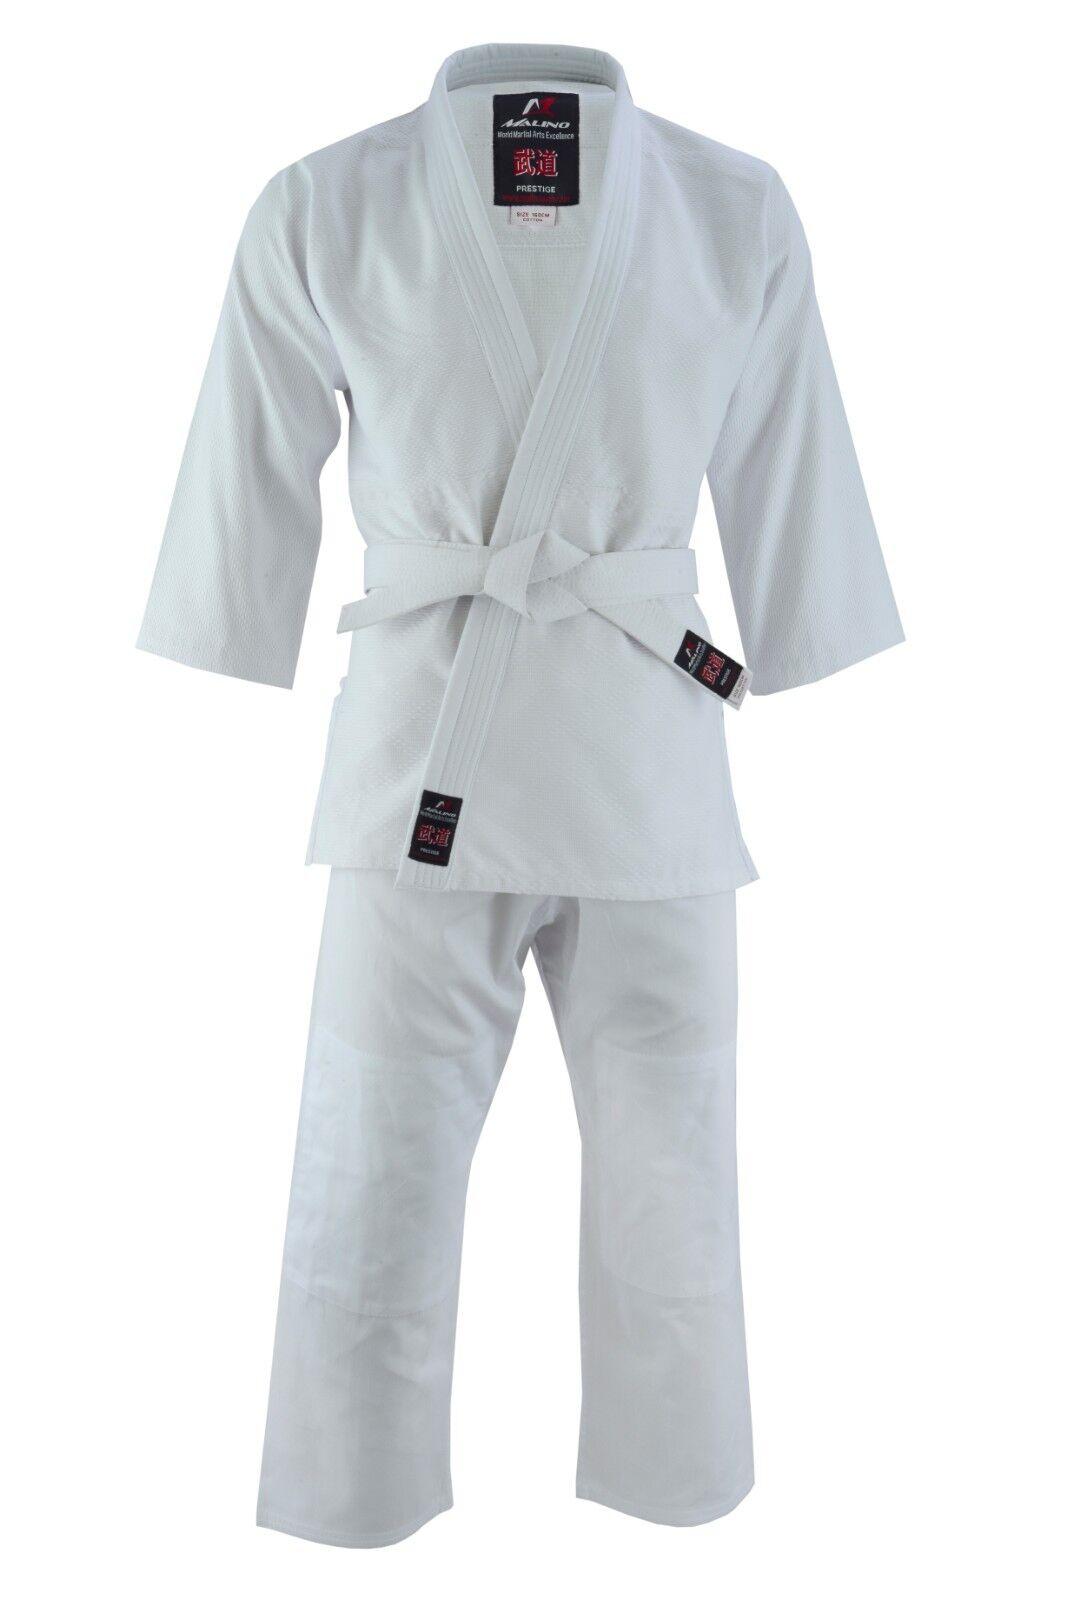 Details about Malino Judo Gi Kids Student Suit Adult Uniform Men All Sizes  Cotton 450gsm White